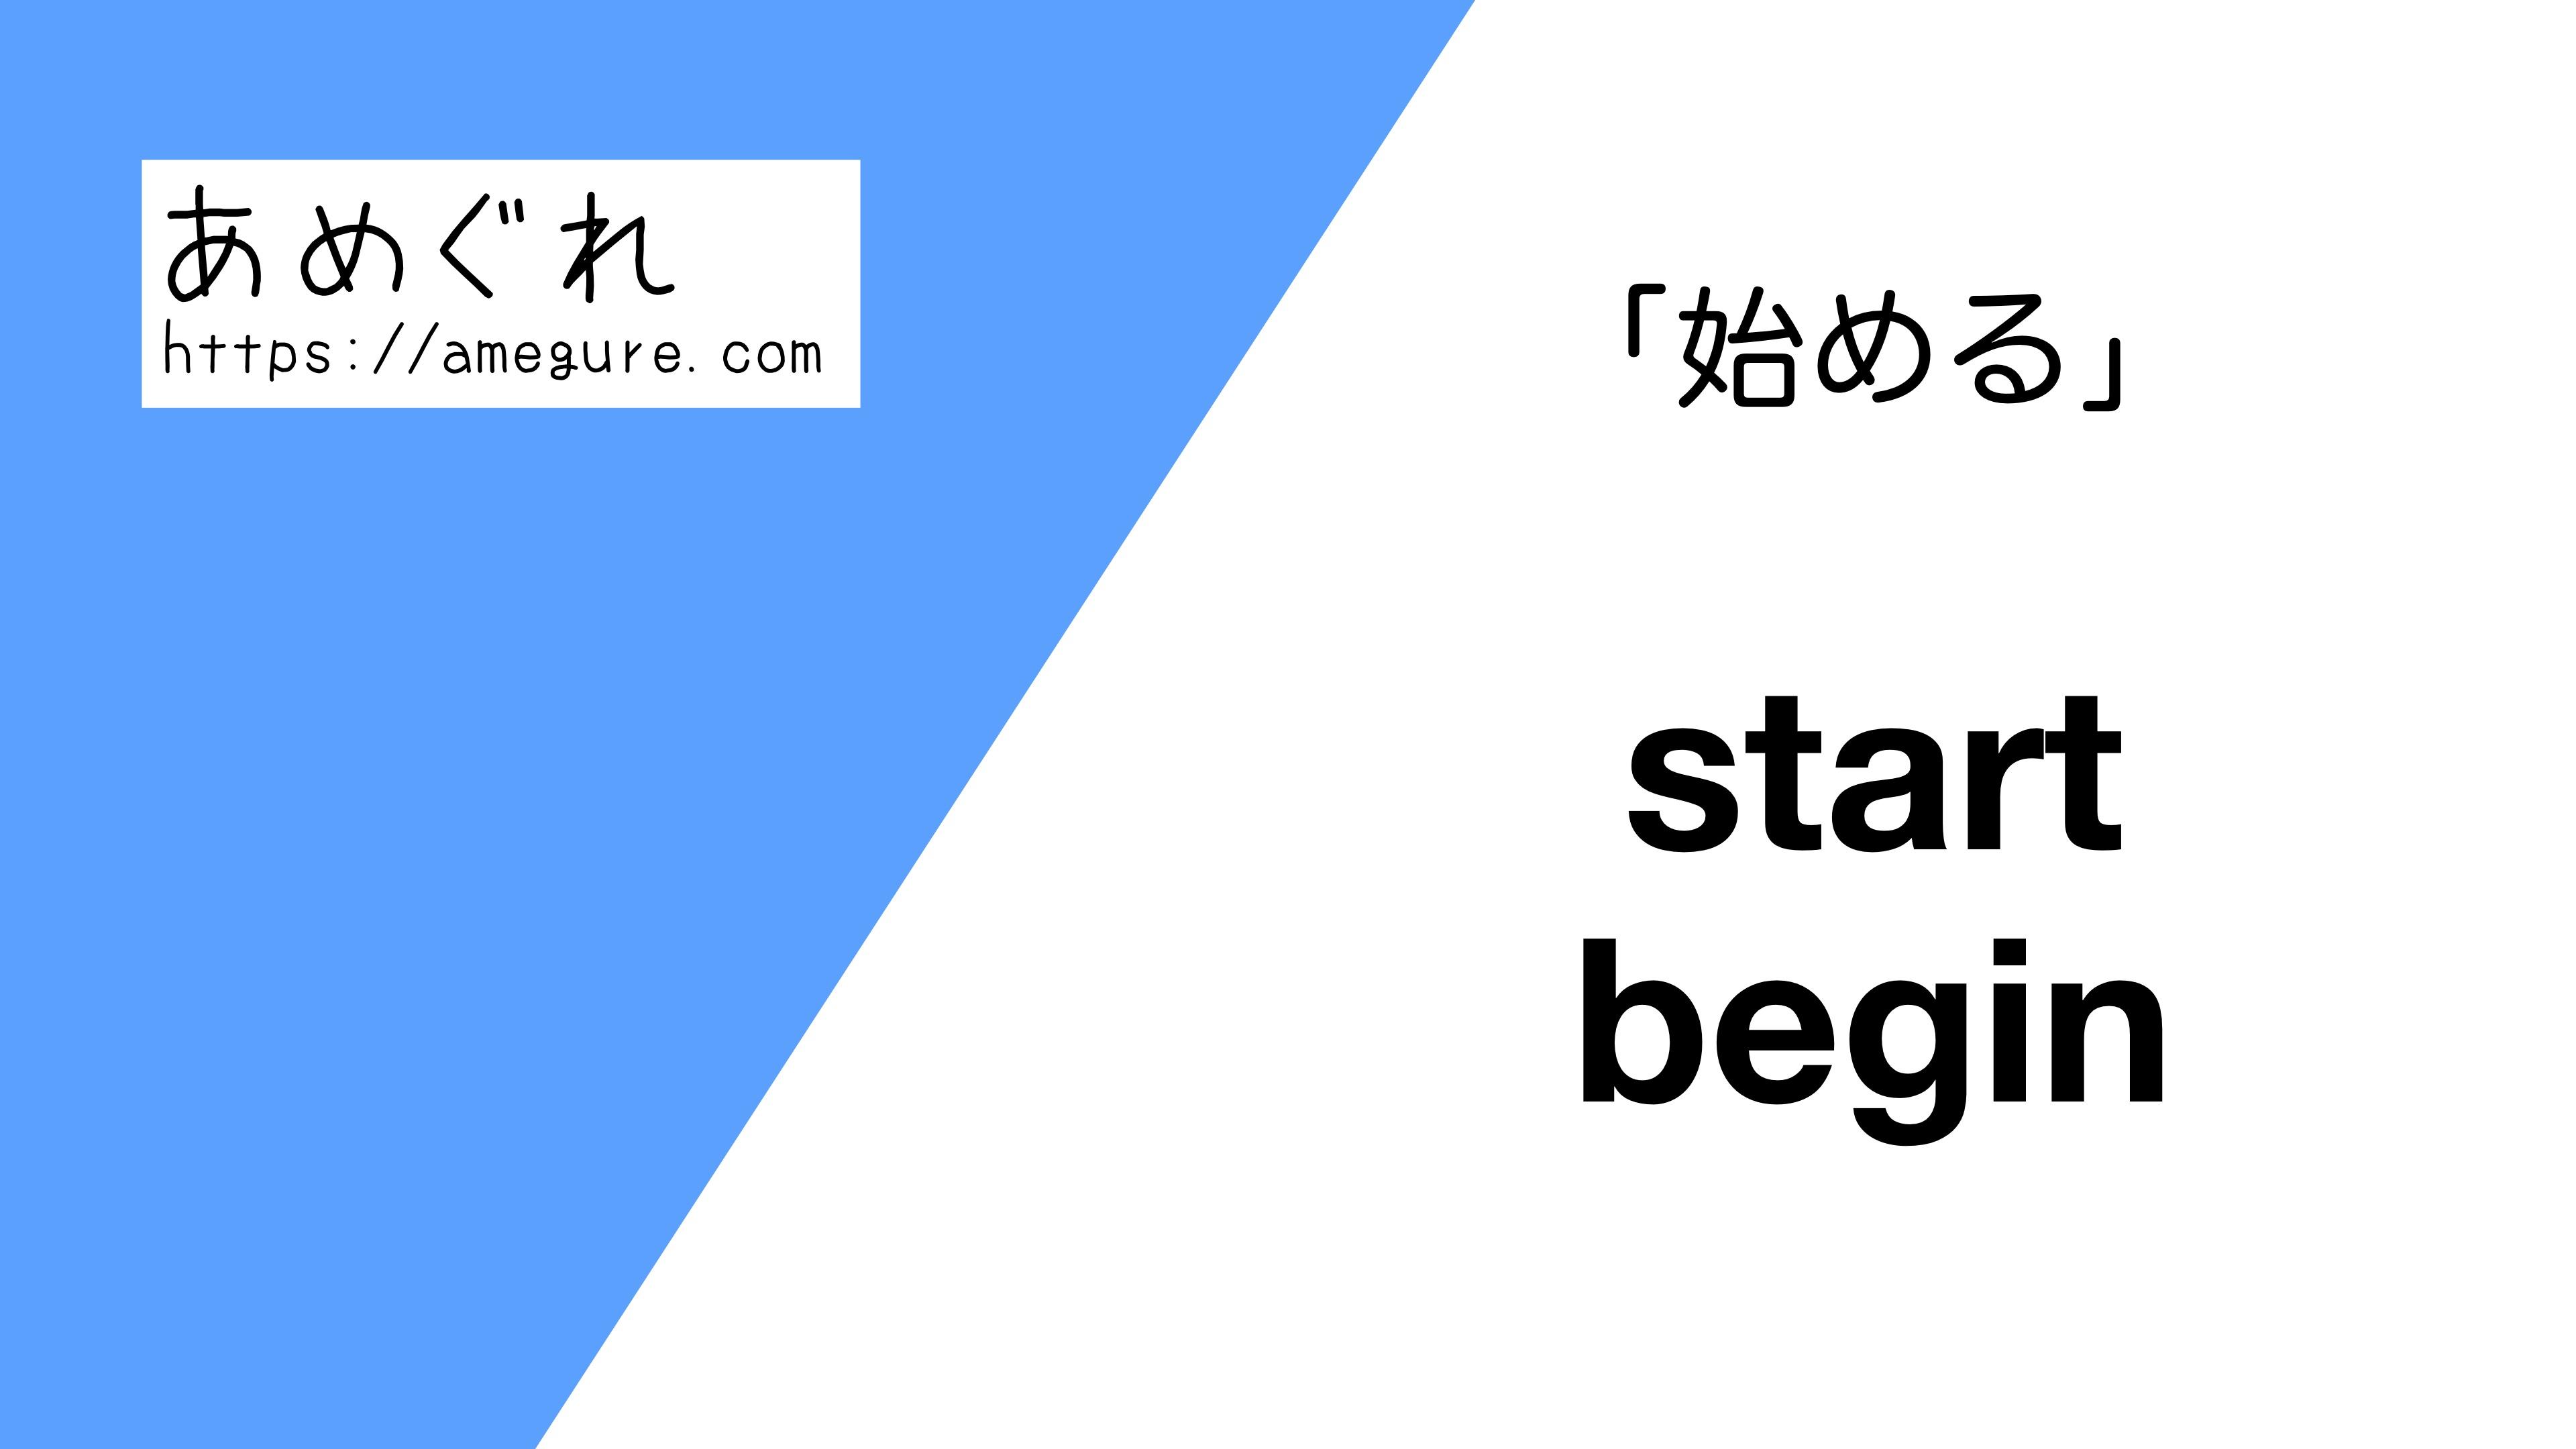 start-begin違い